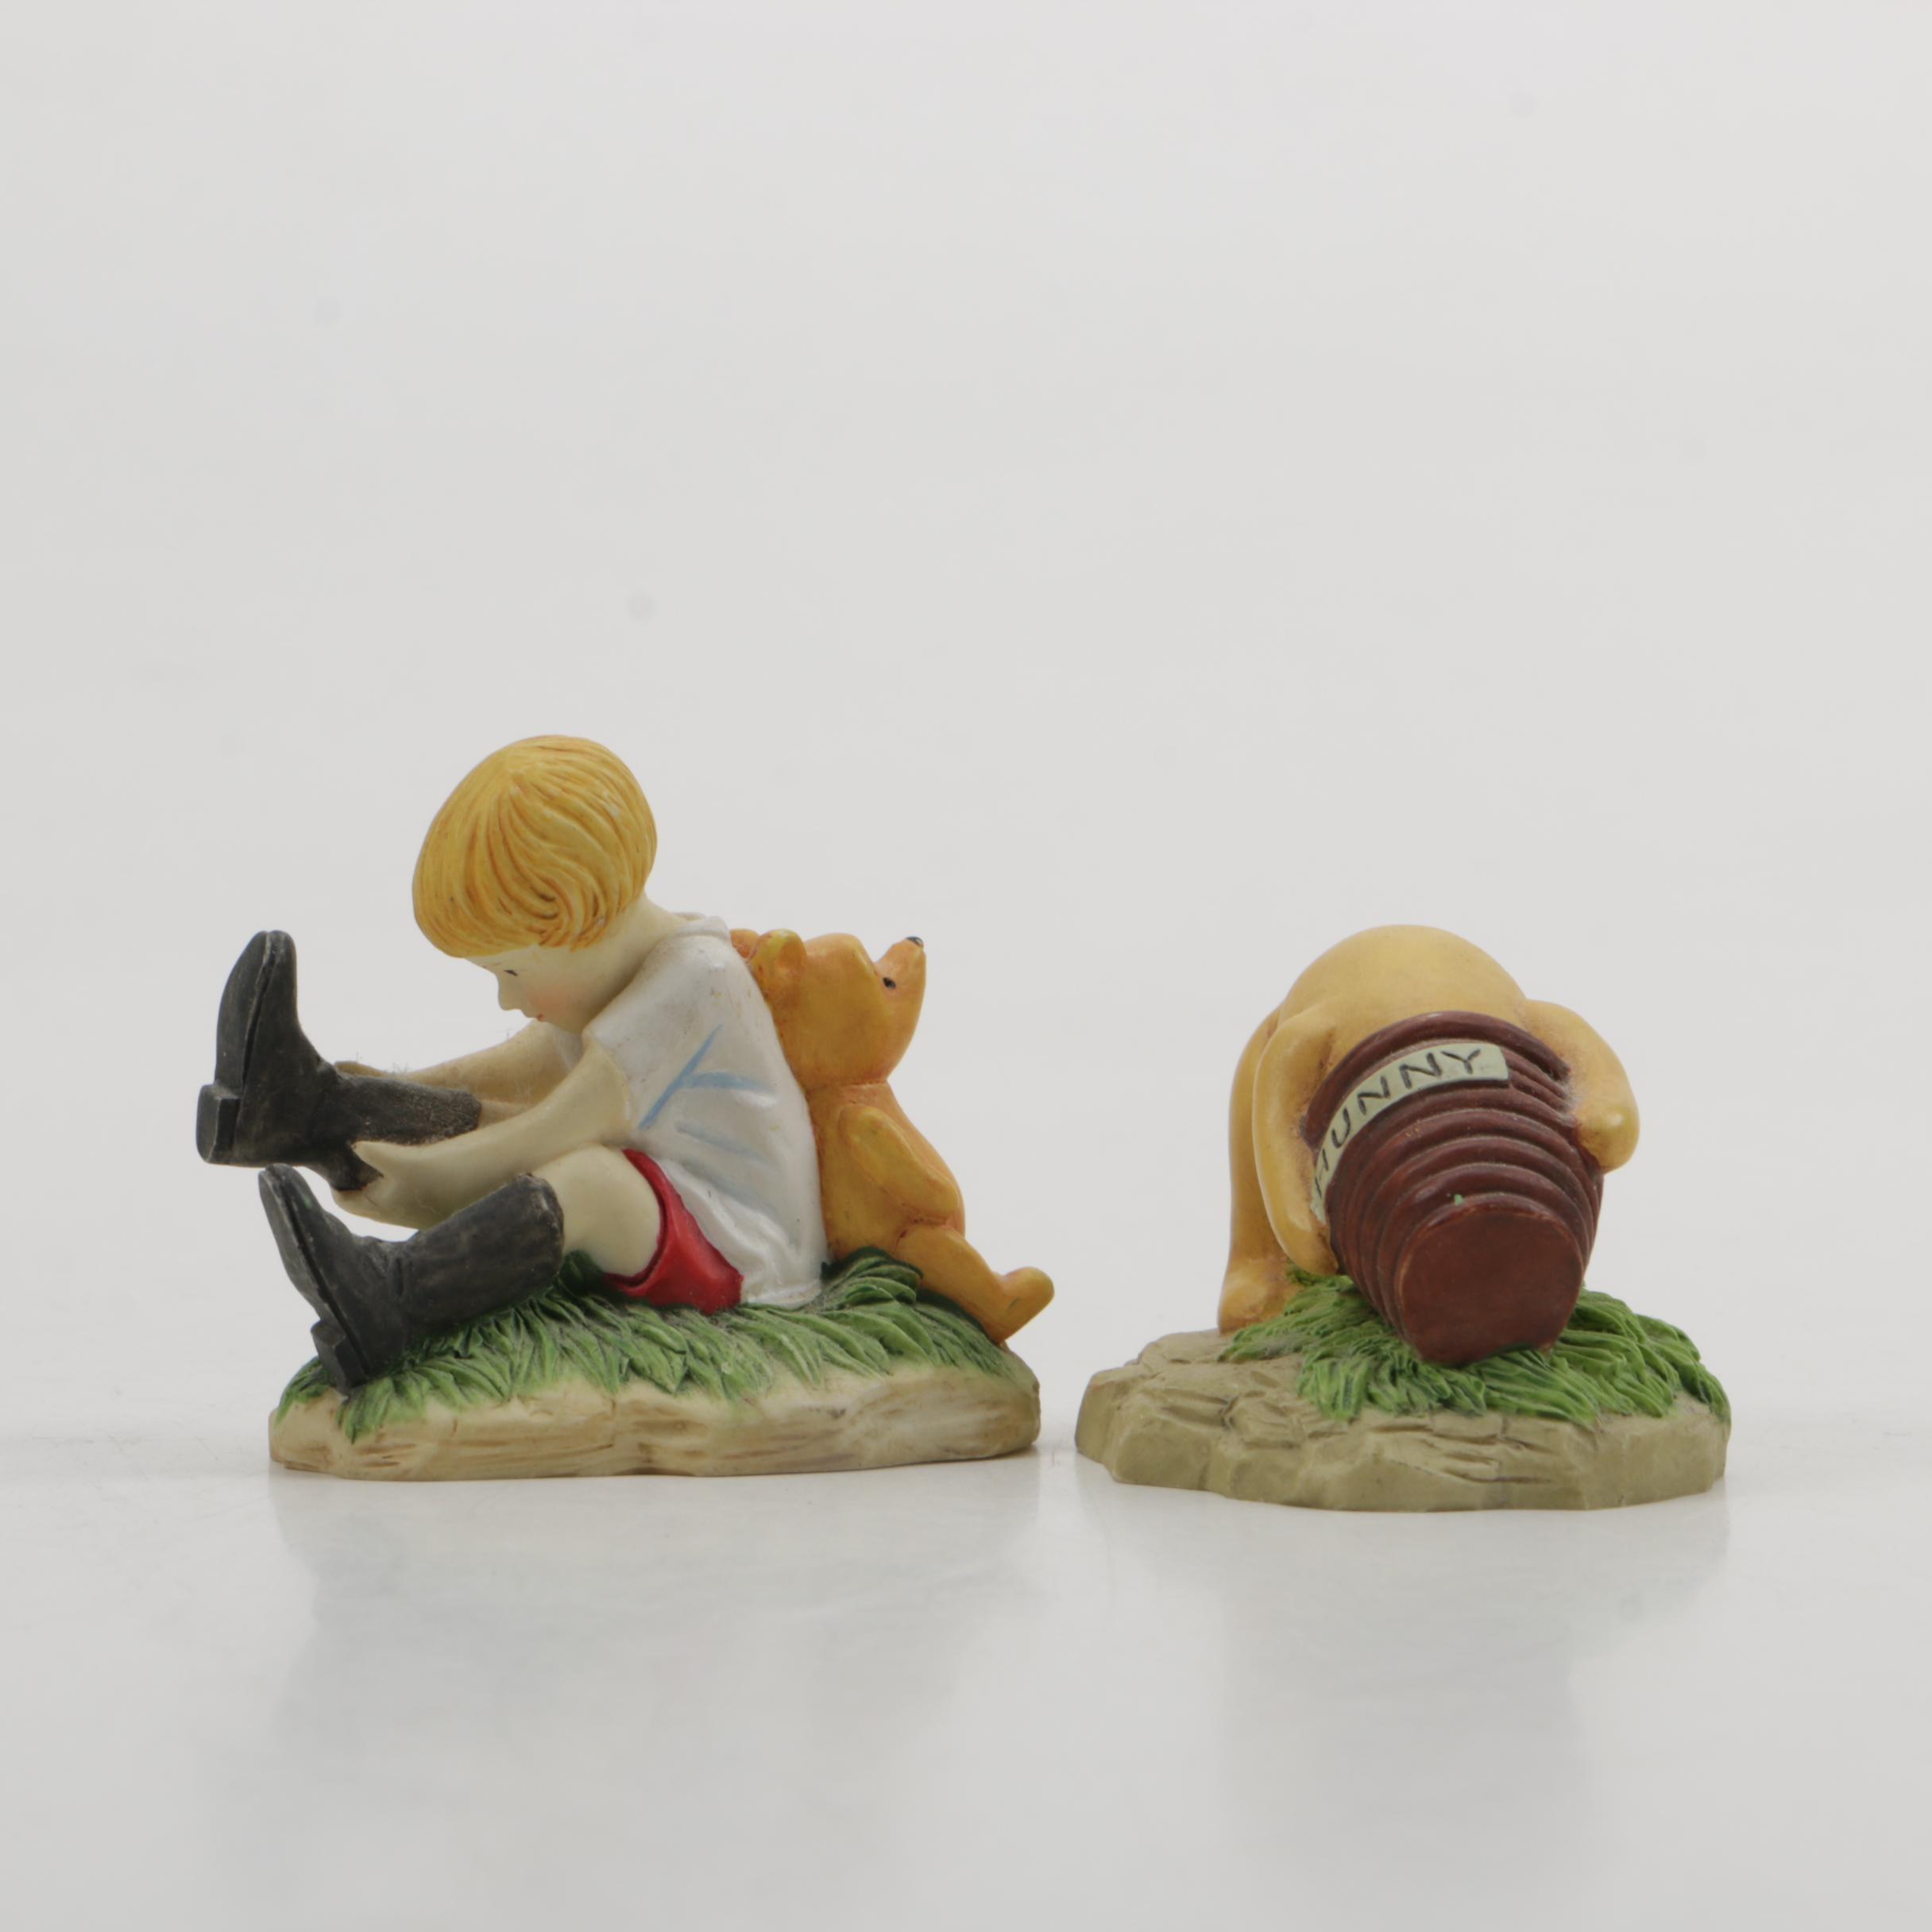 Pair of Lenox Winnie the Pooh Figurines